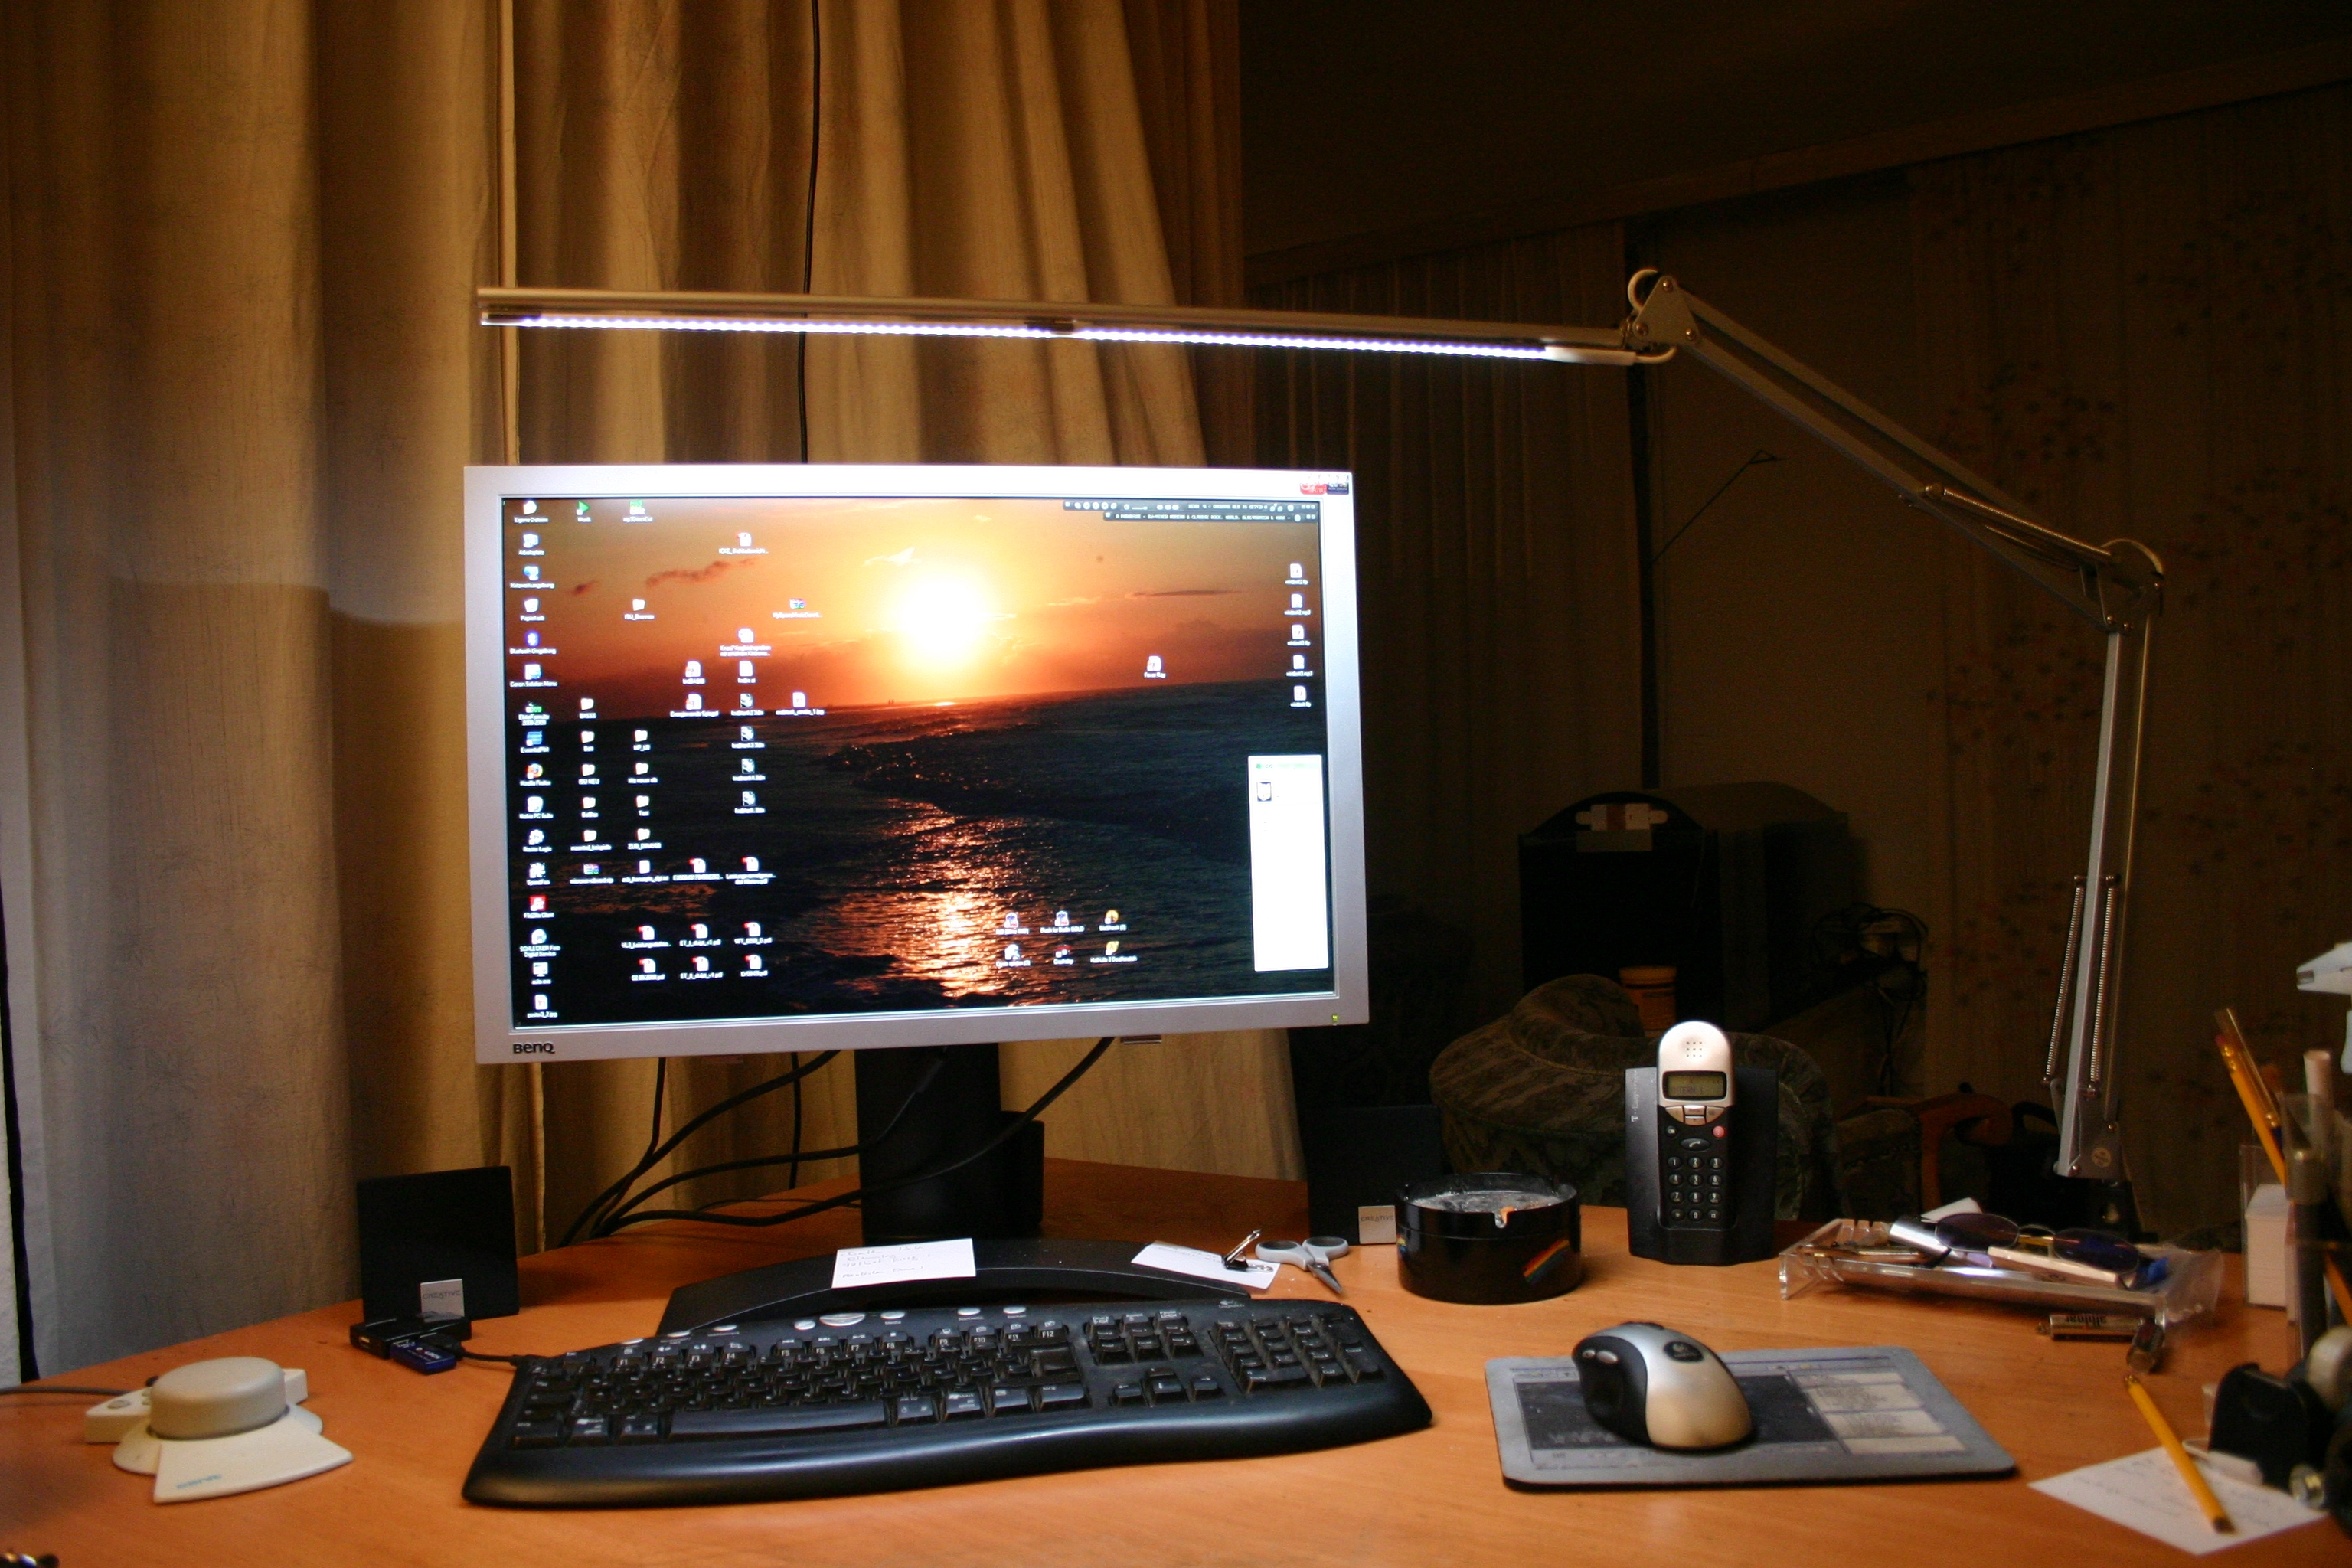 LED-desktop / workspace / keyboard lamp (IKEA Tertial hack)